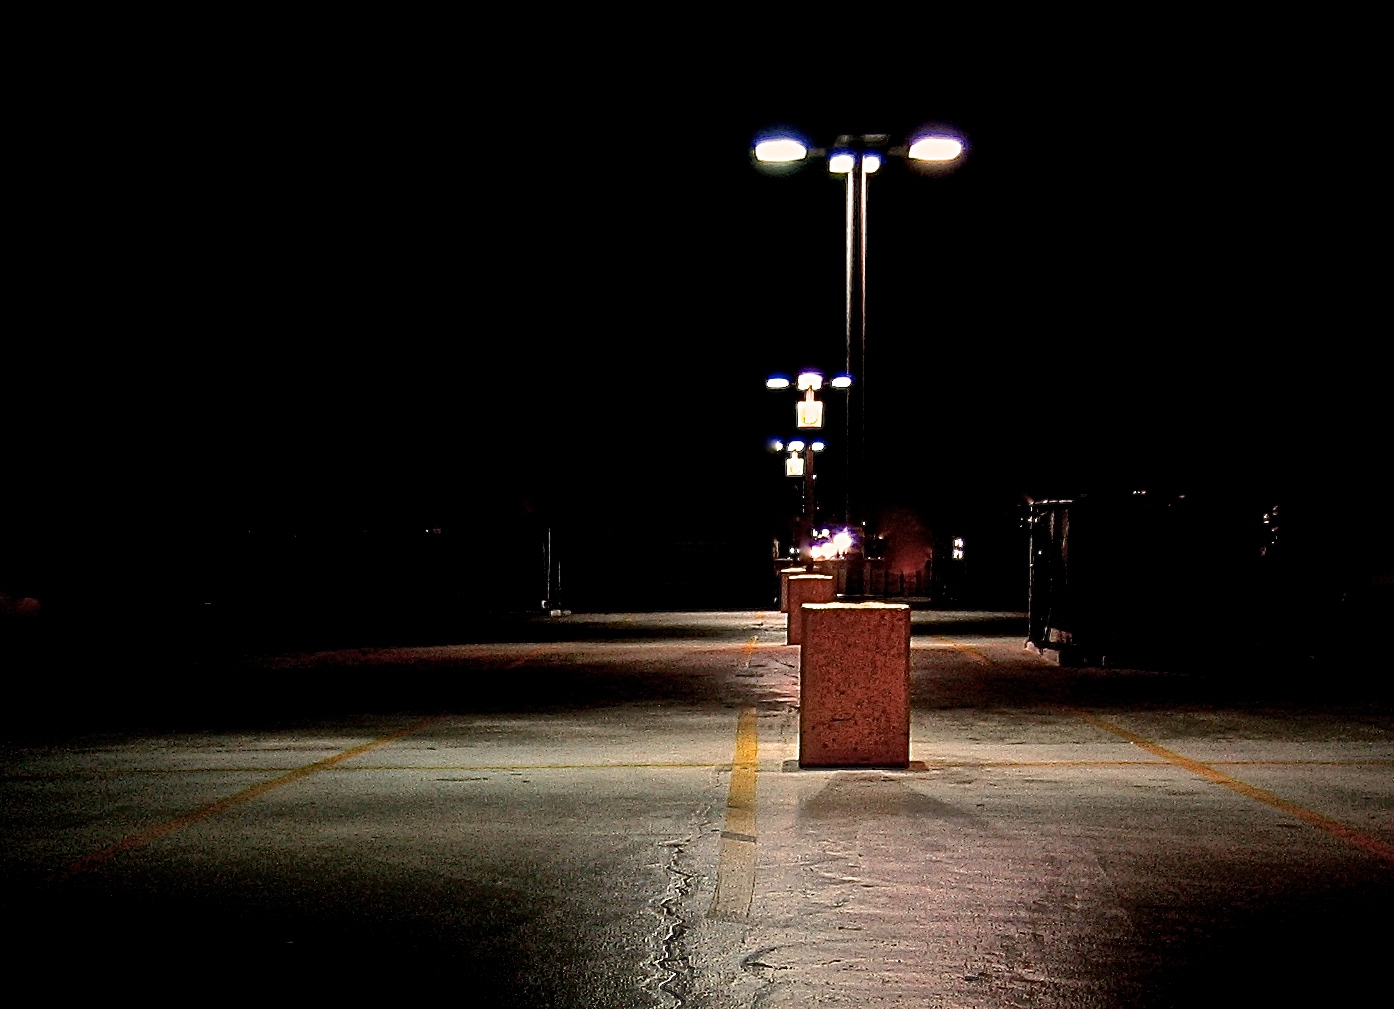 close on the lamp very dark.442692499_145a72a168_o.jpg